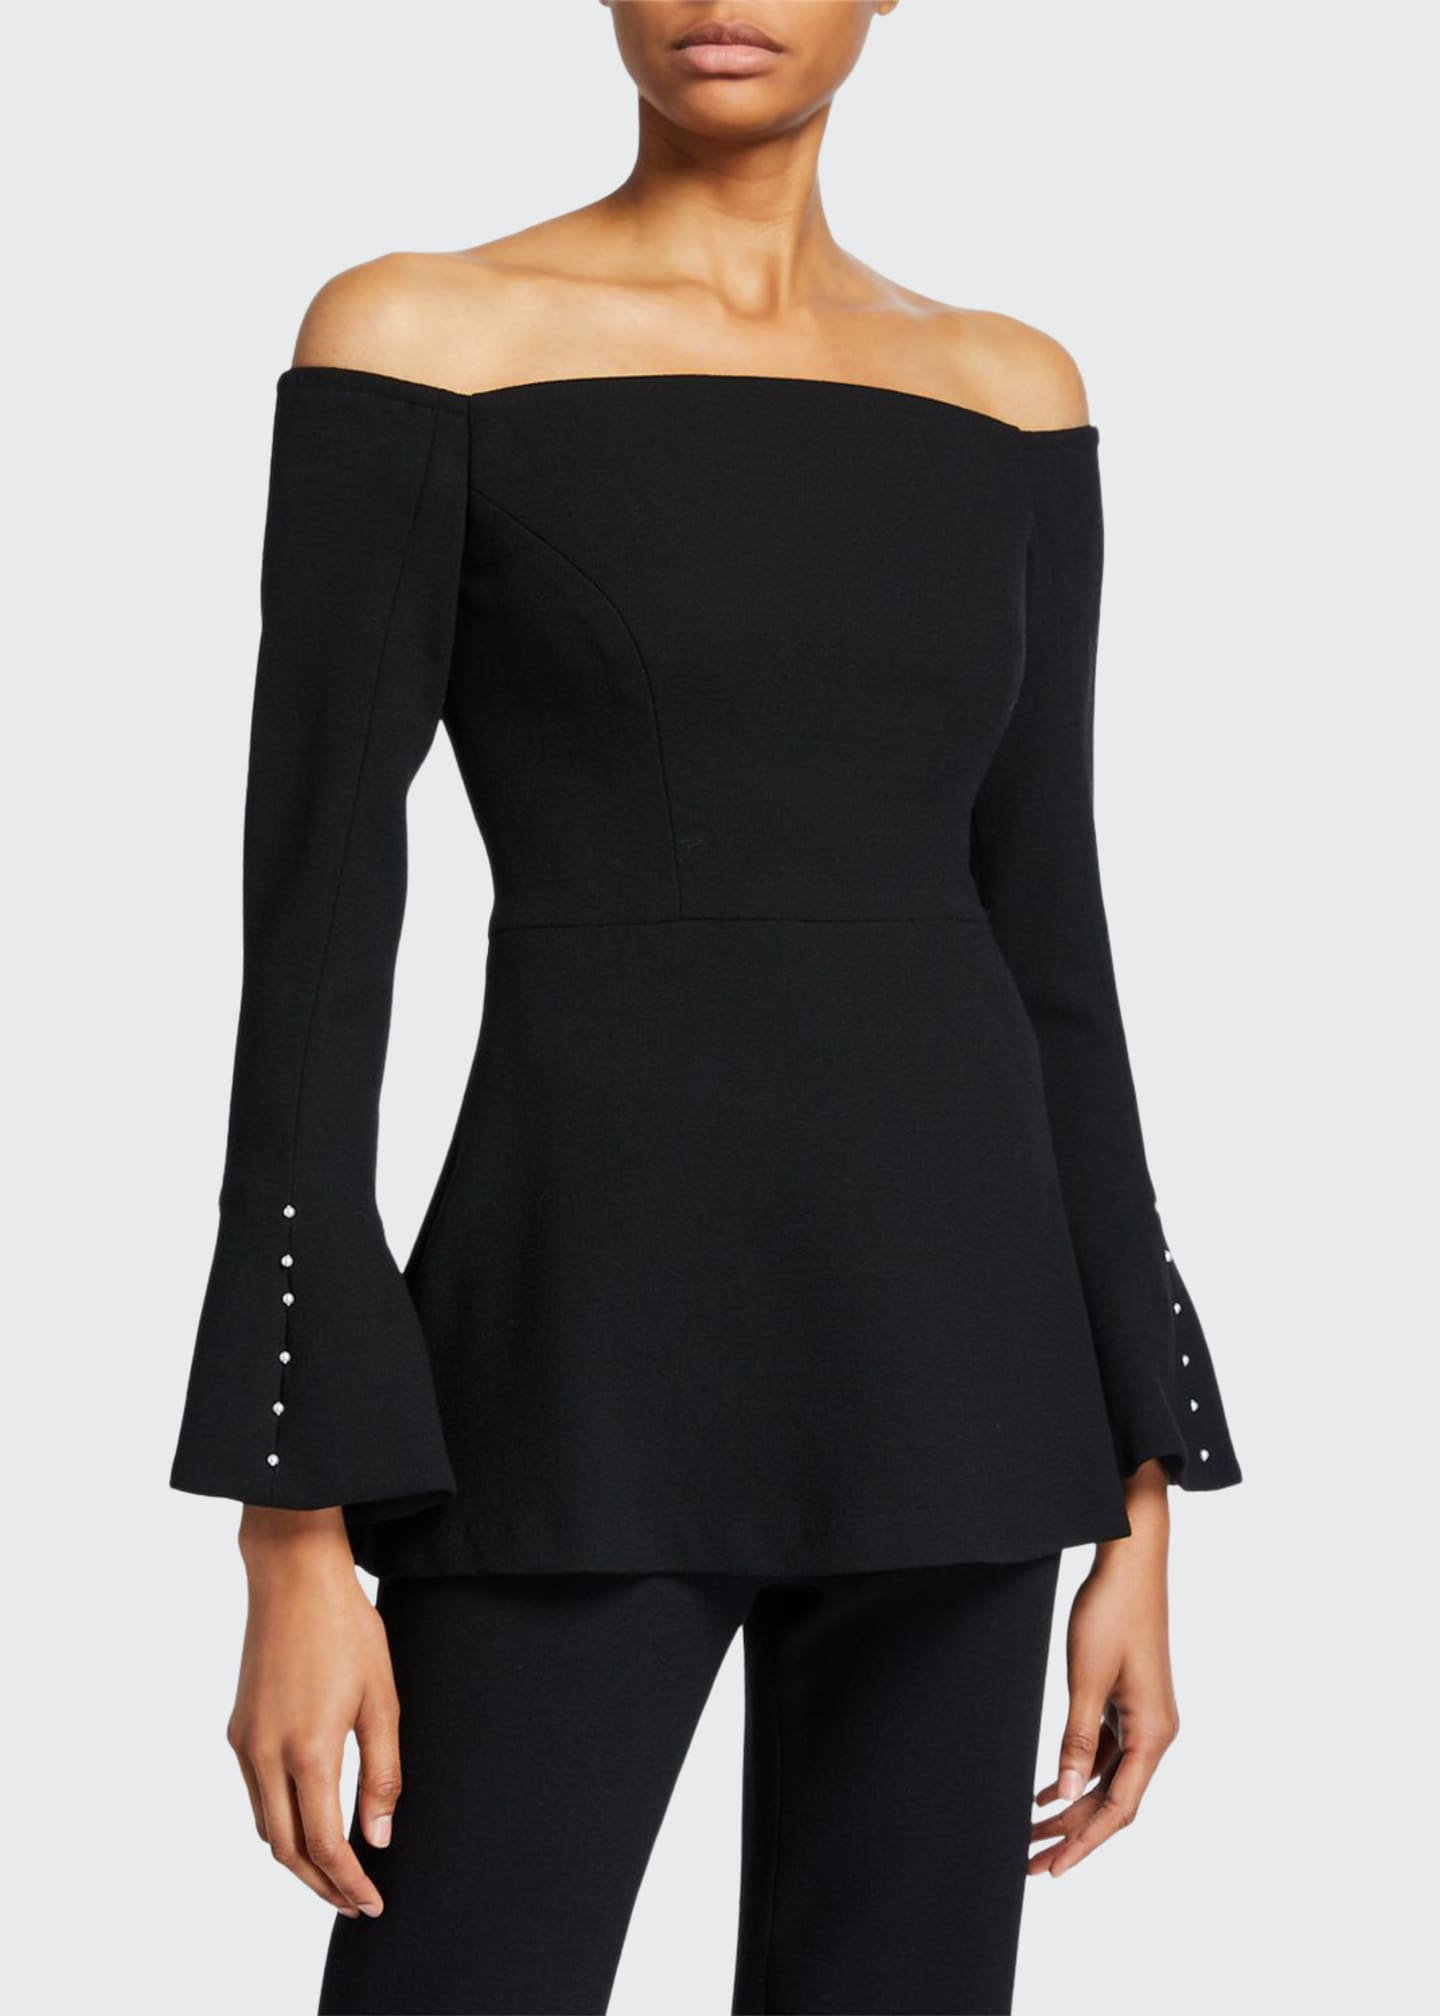 Lela Rose Wool Crepe Off-the-Shoulder Pearly Sleeve Top